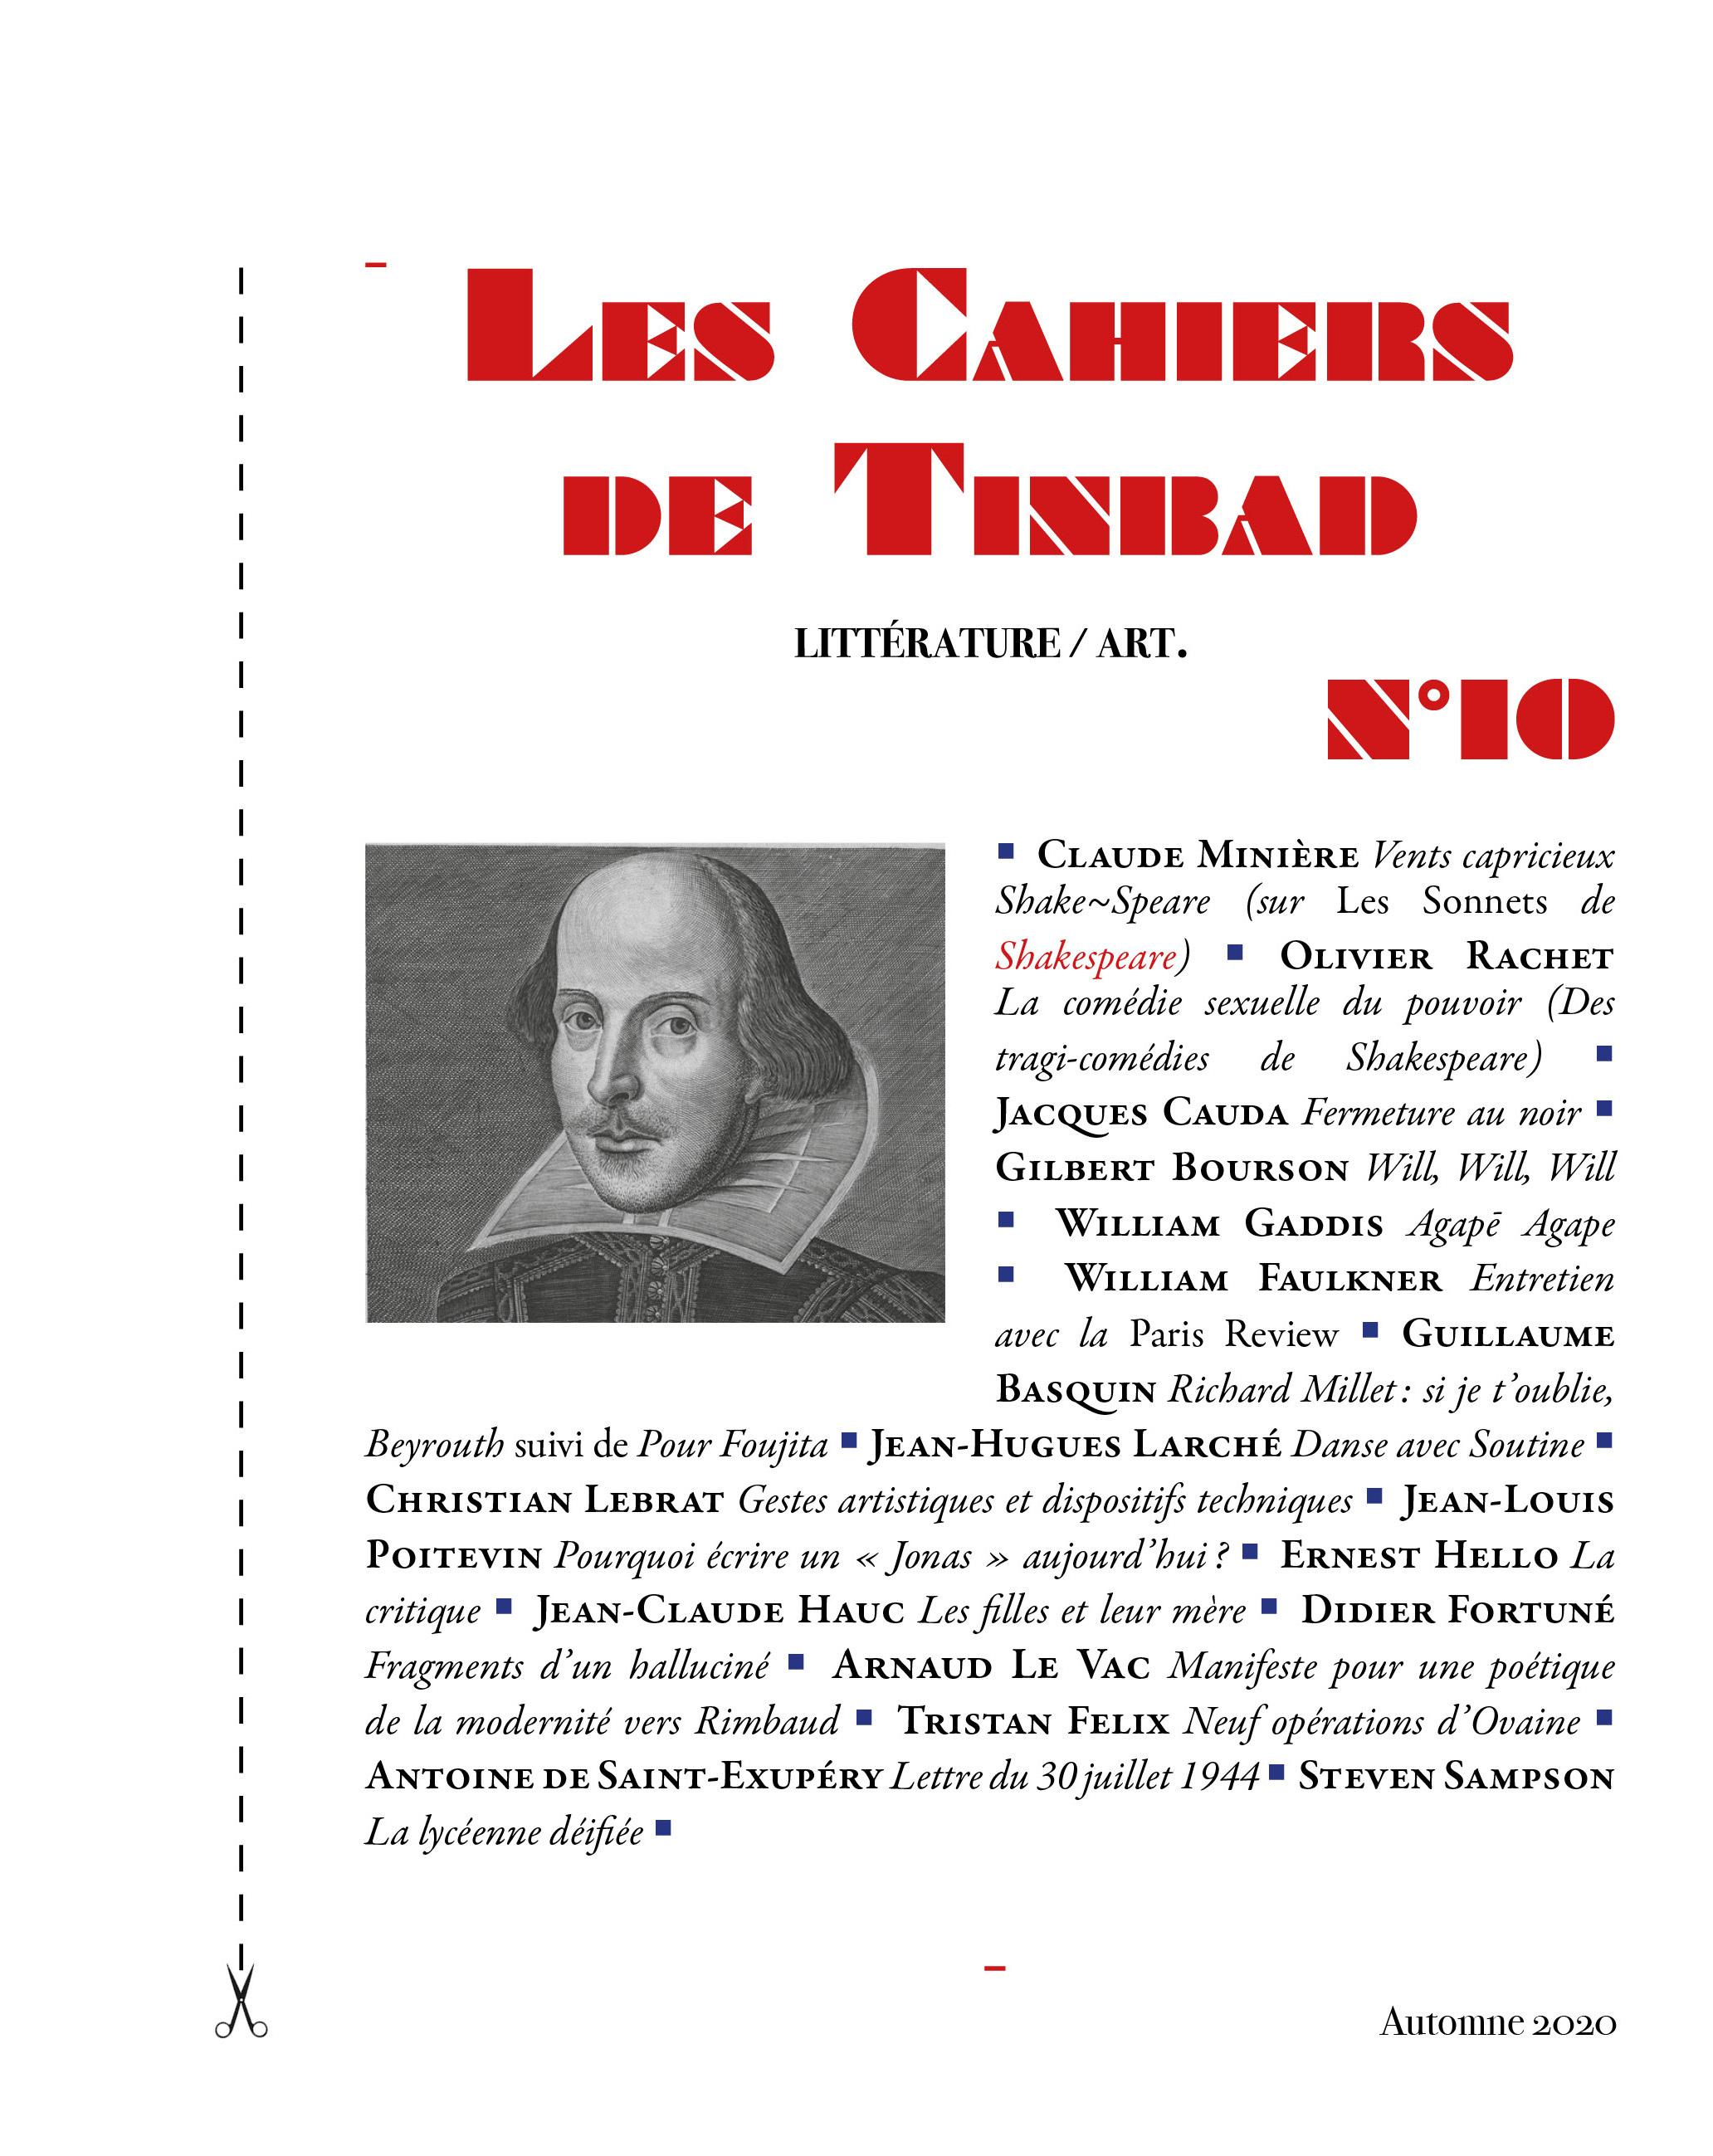 LES CAHIERS DE TINBAD N 10